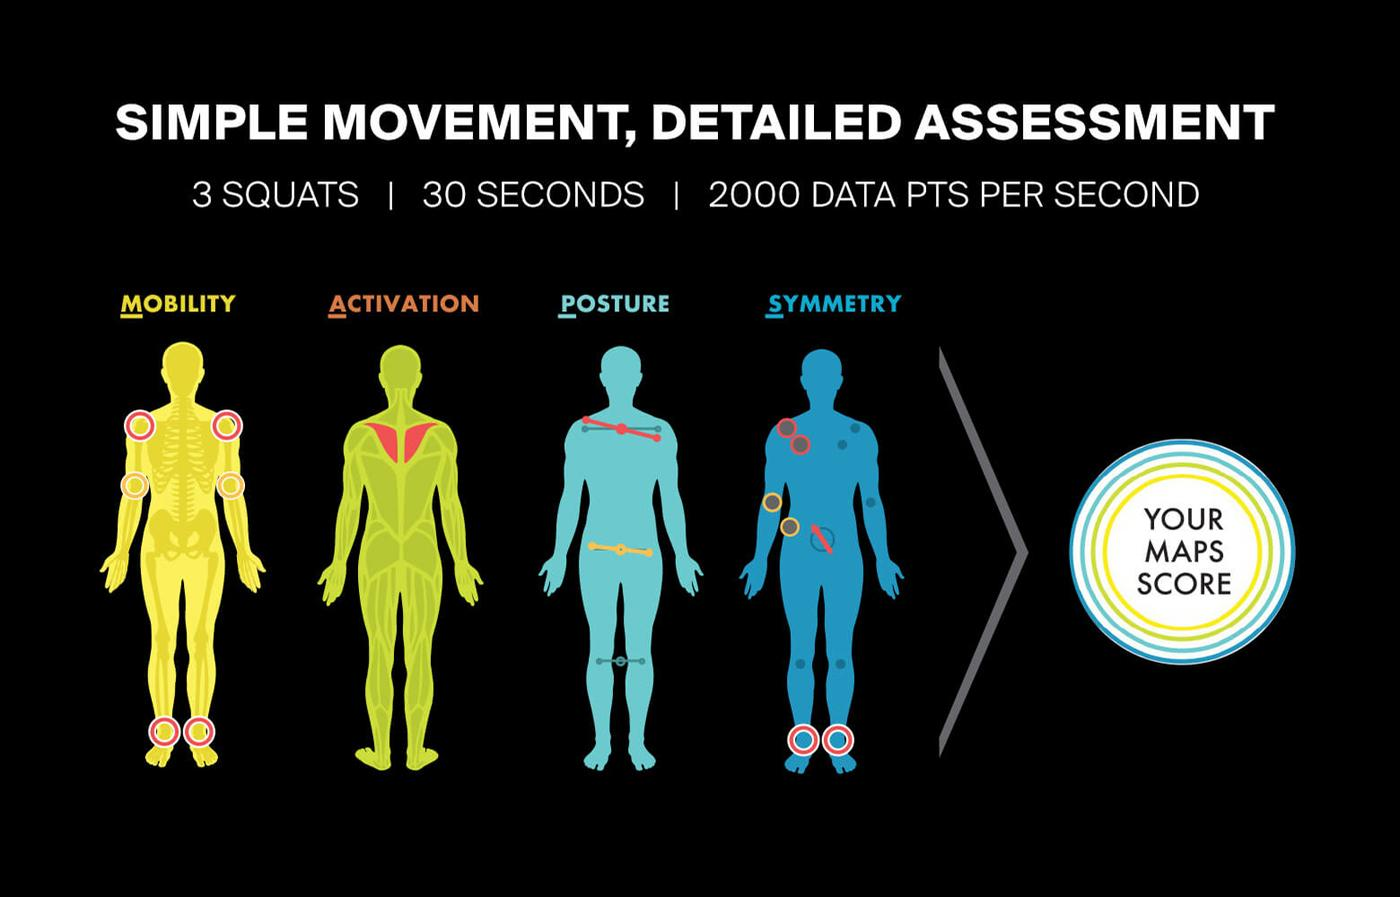 The TRX technology identifies movement inefficiencies across four critical categories – mobility, activation, posture and symmetry / TRX